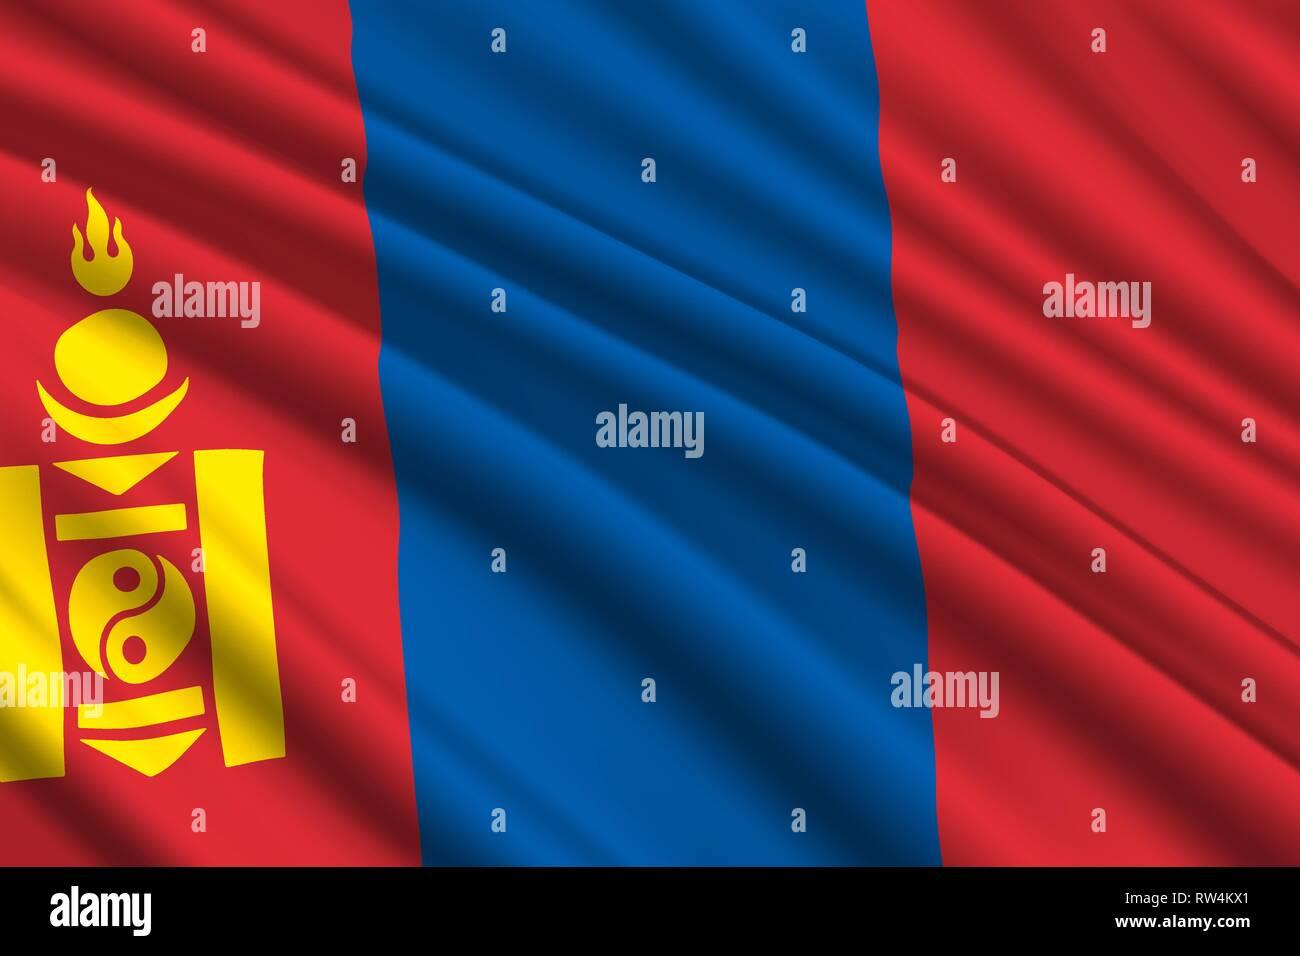 waving flag of Mongolia. Vector illustration - Stock Vector